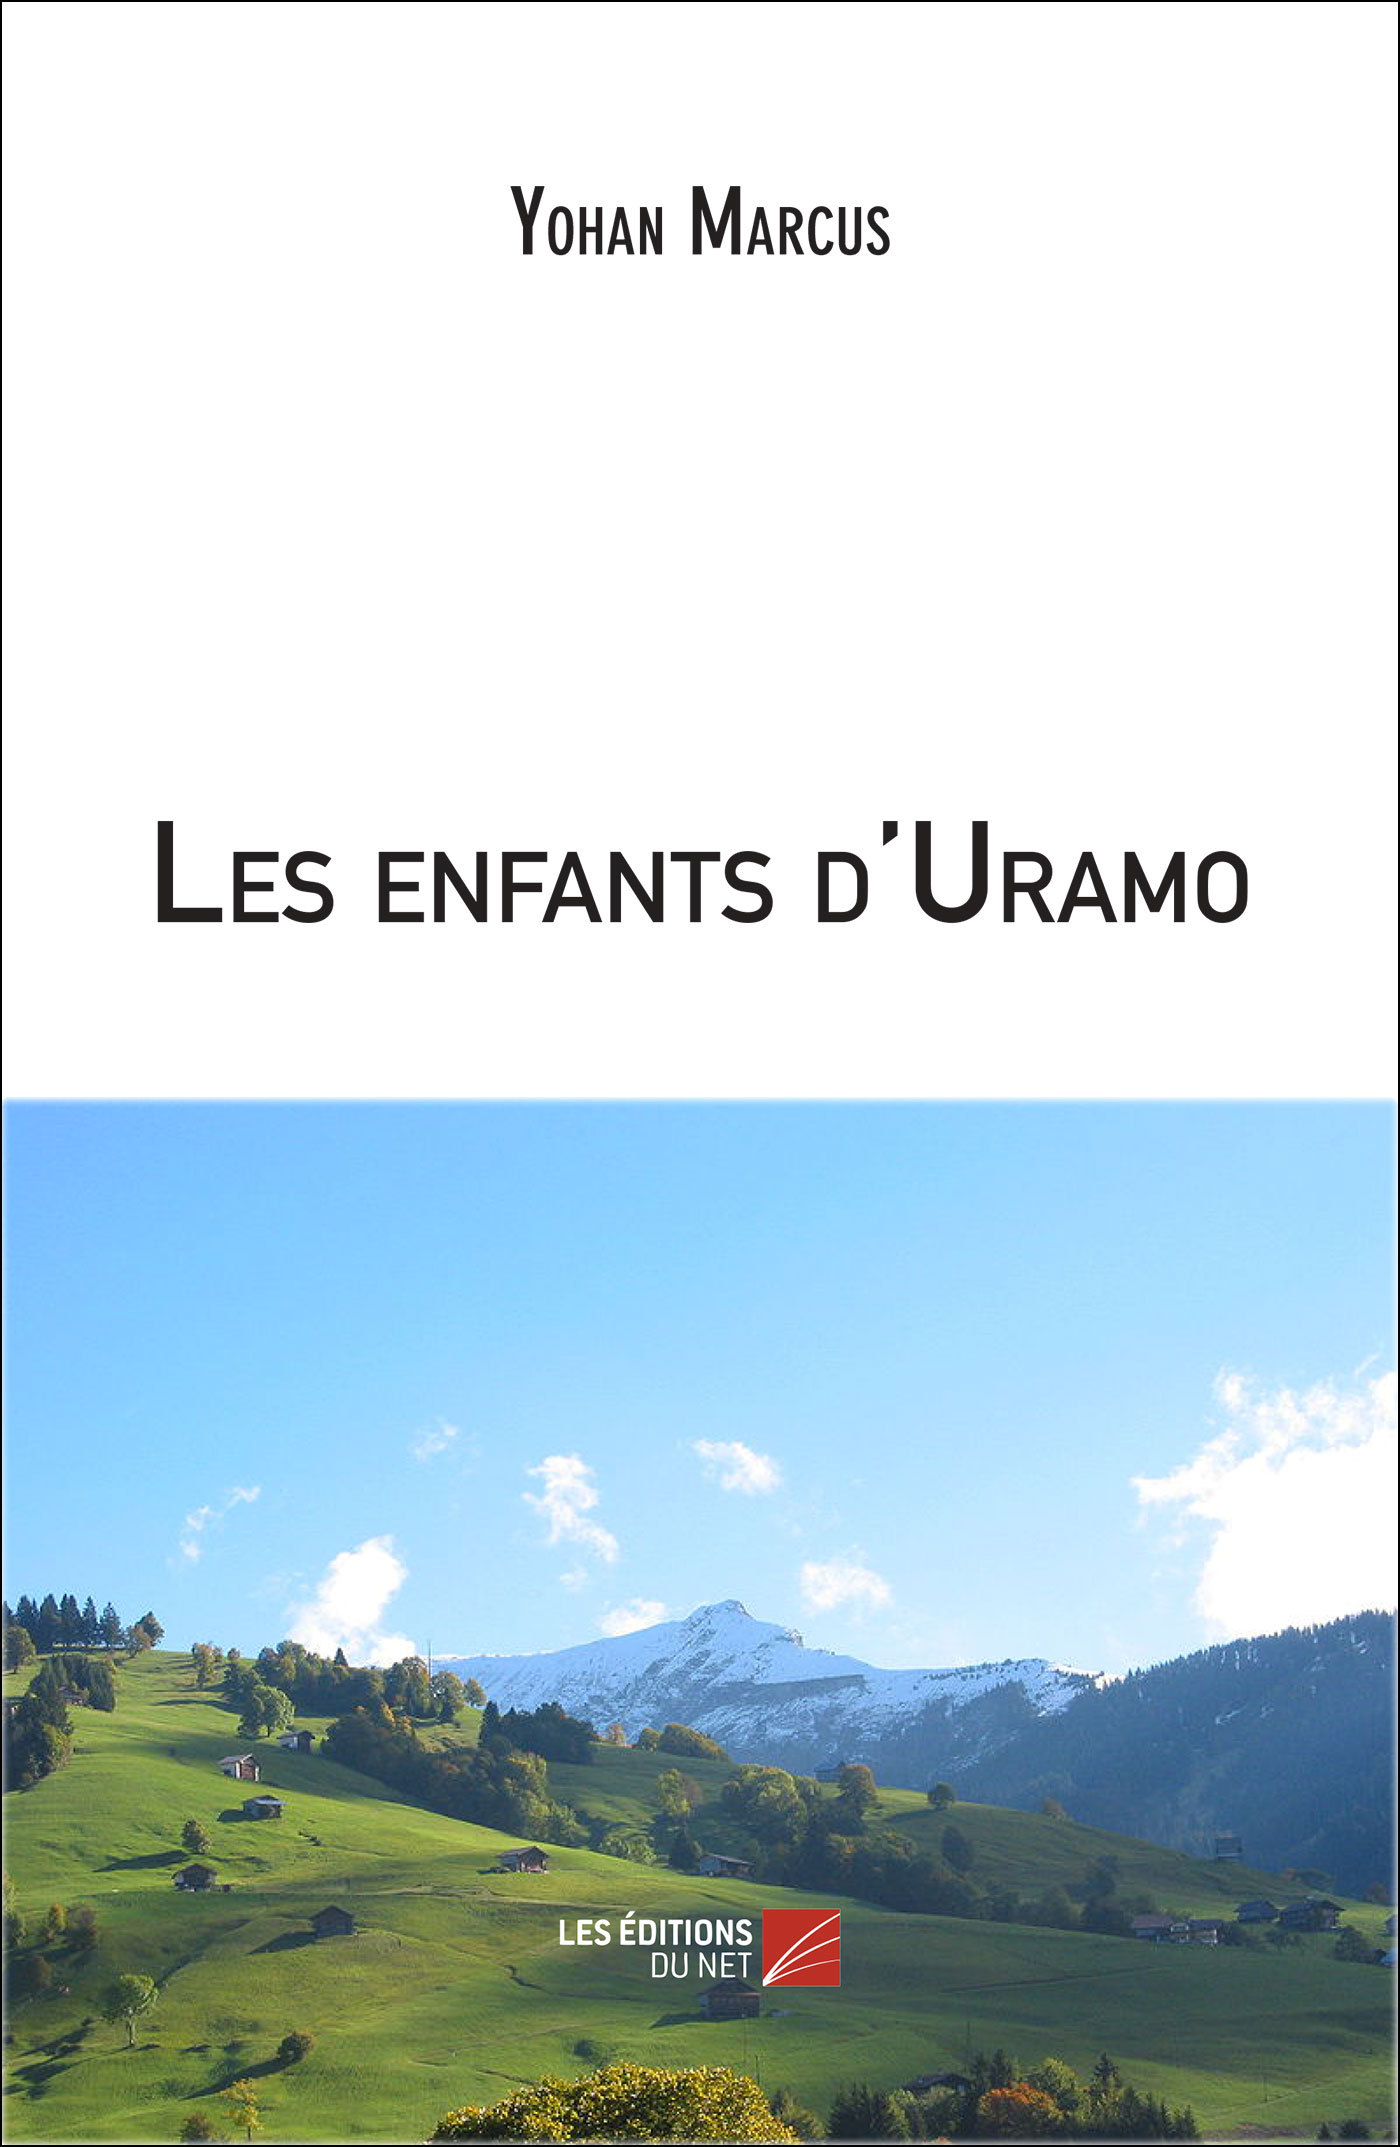 LES ENFANTS D'URAMO